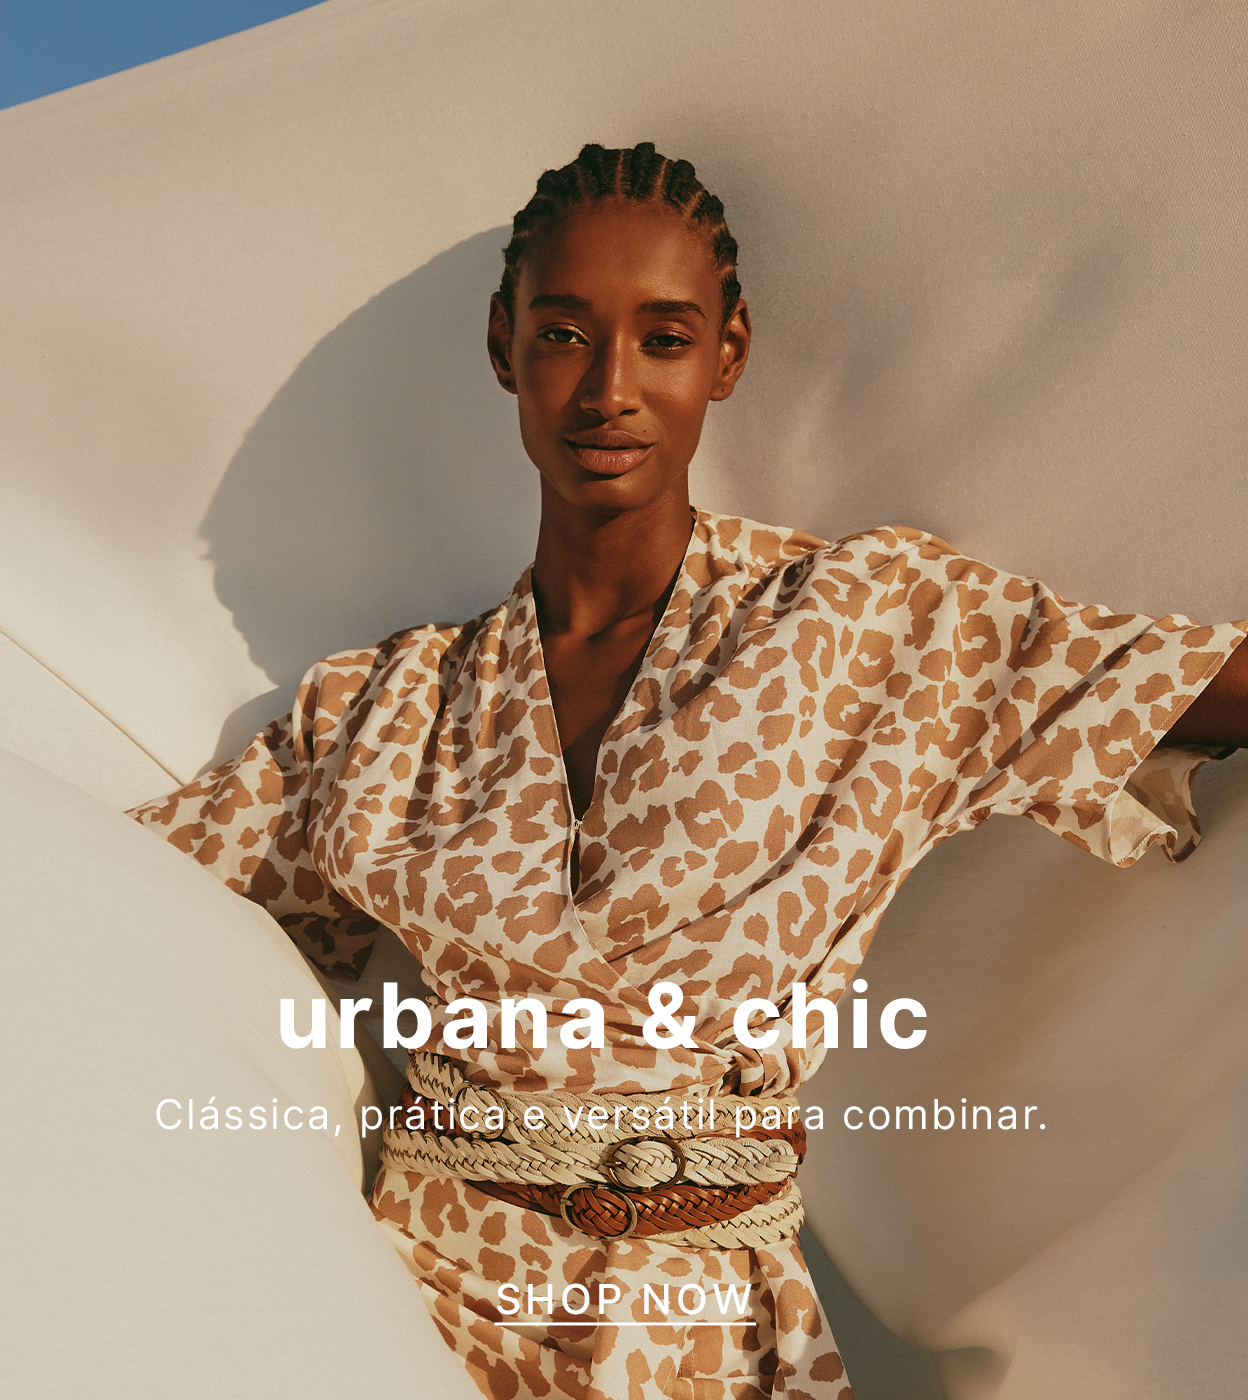 Urbana e Chic